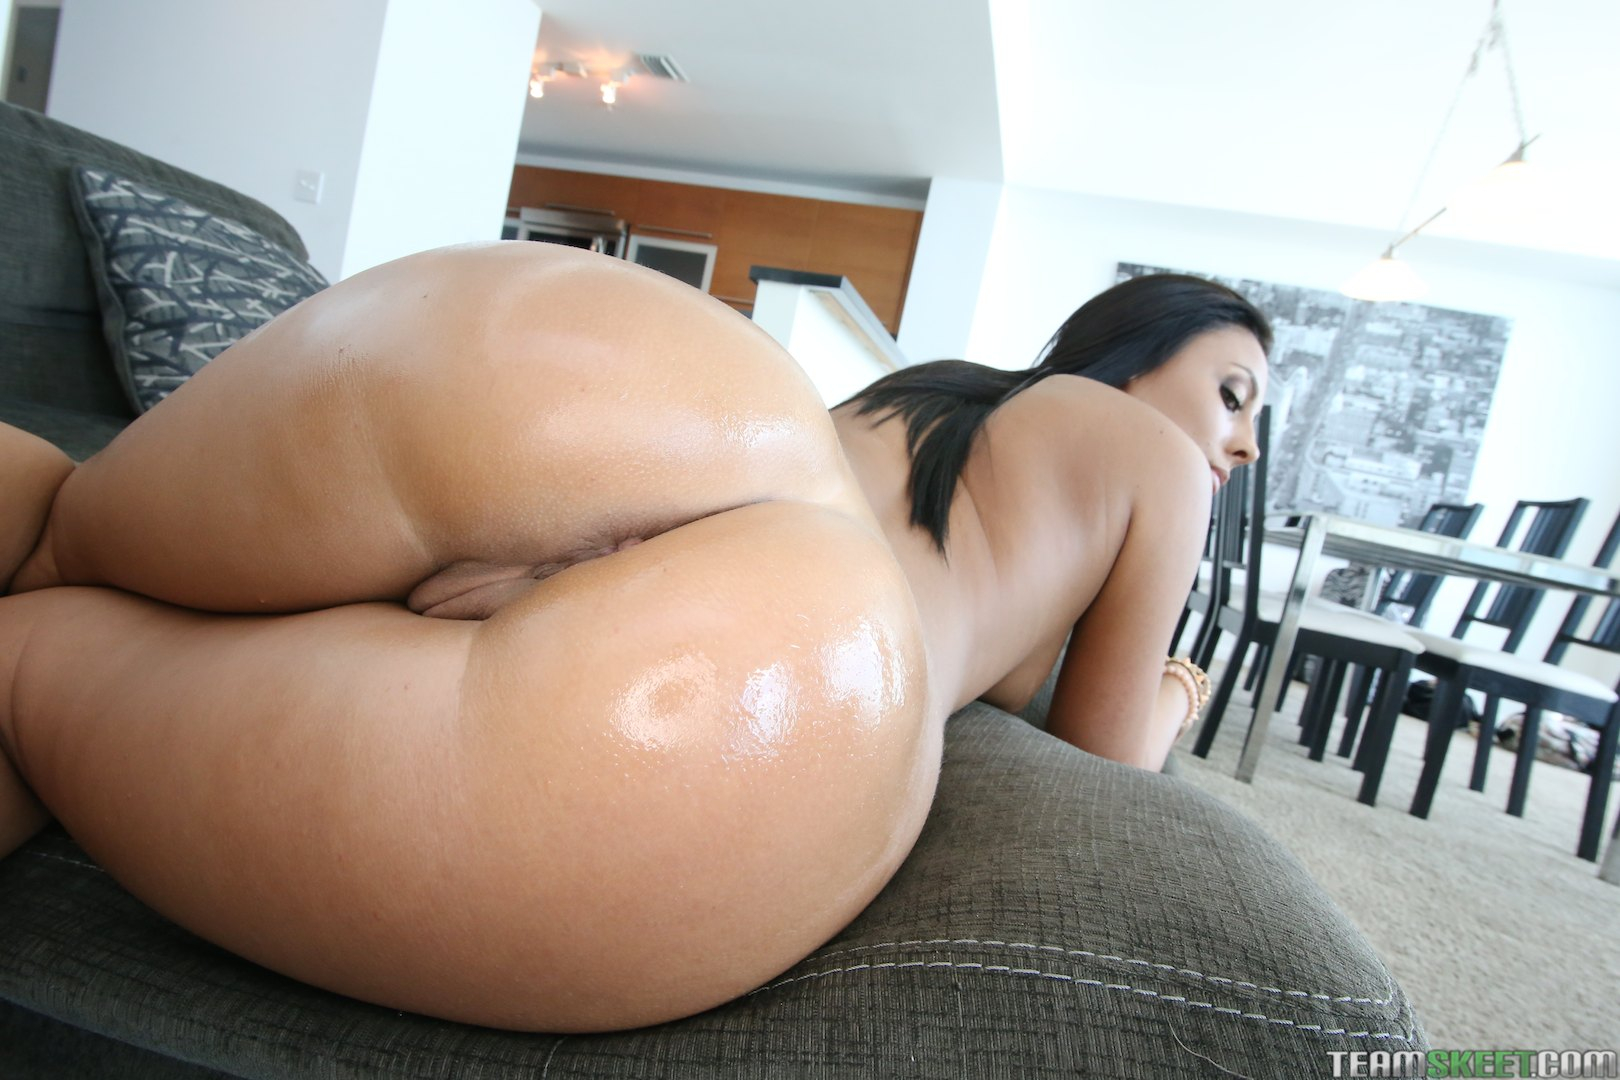 Lovely latina ladies sexy pussy-8911